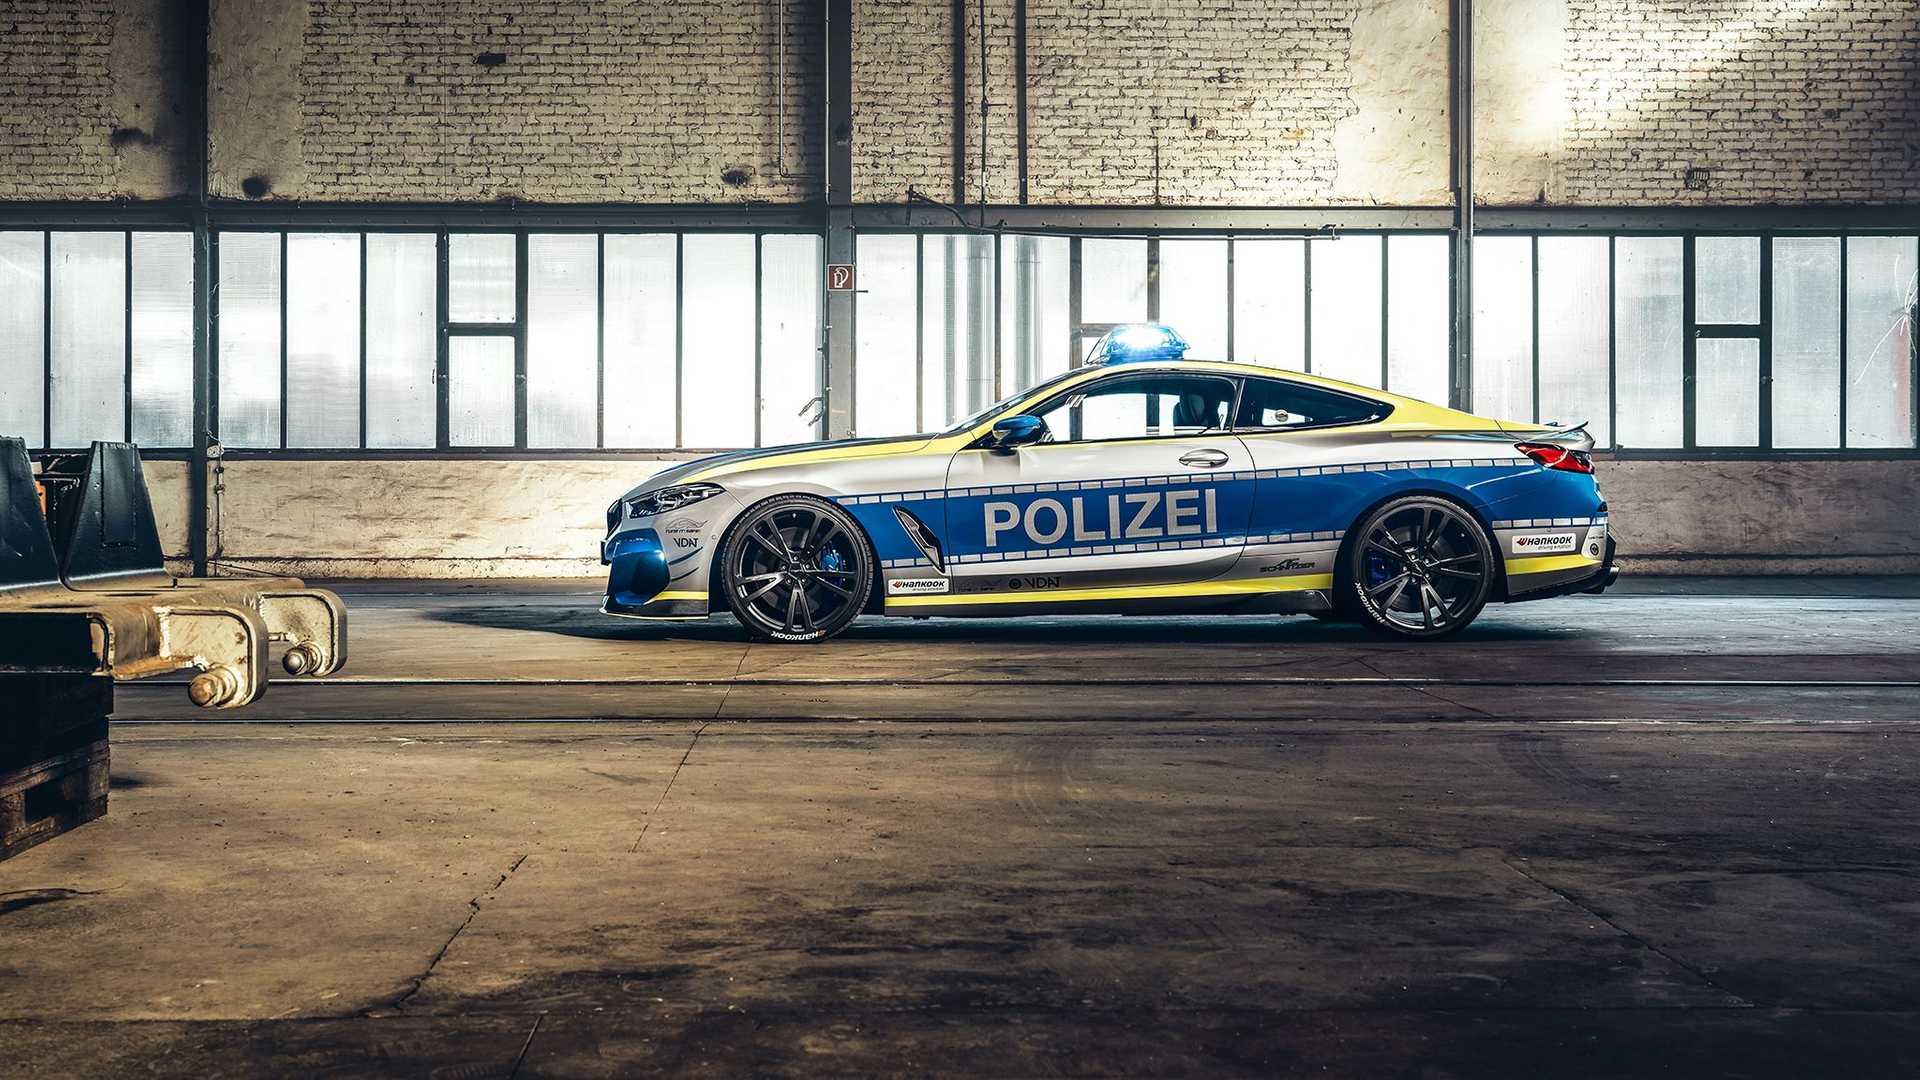 BMW-M850i-police-car-tune-it-safe-25